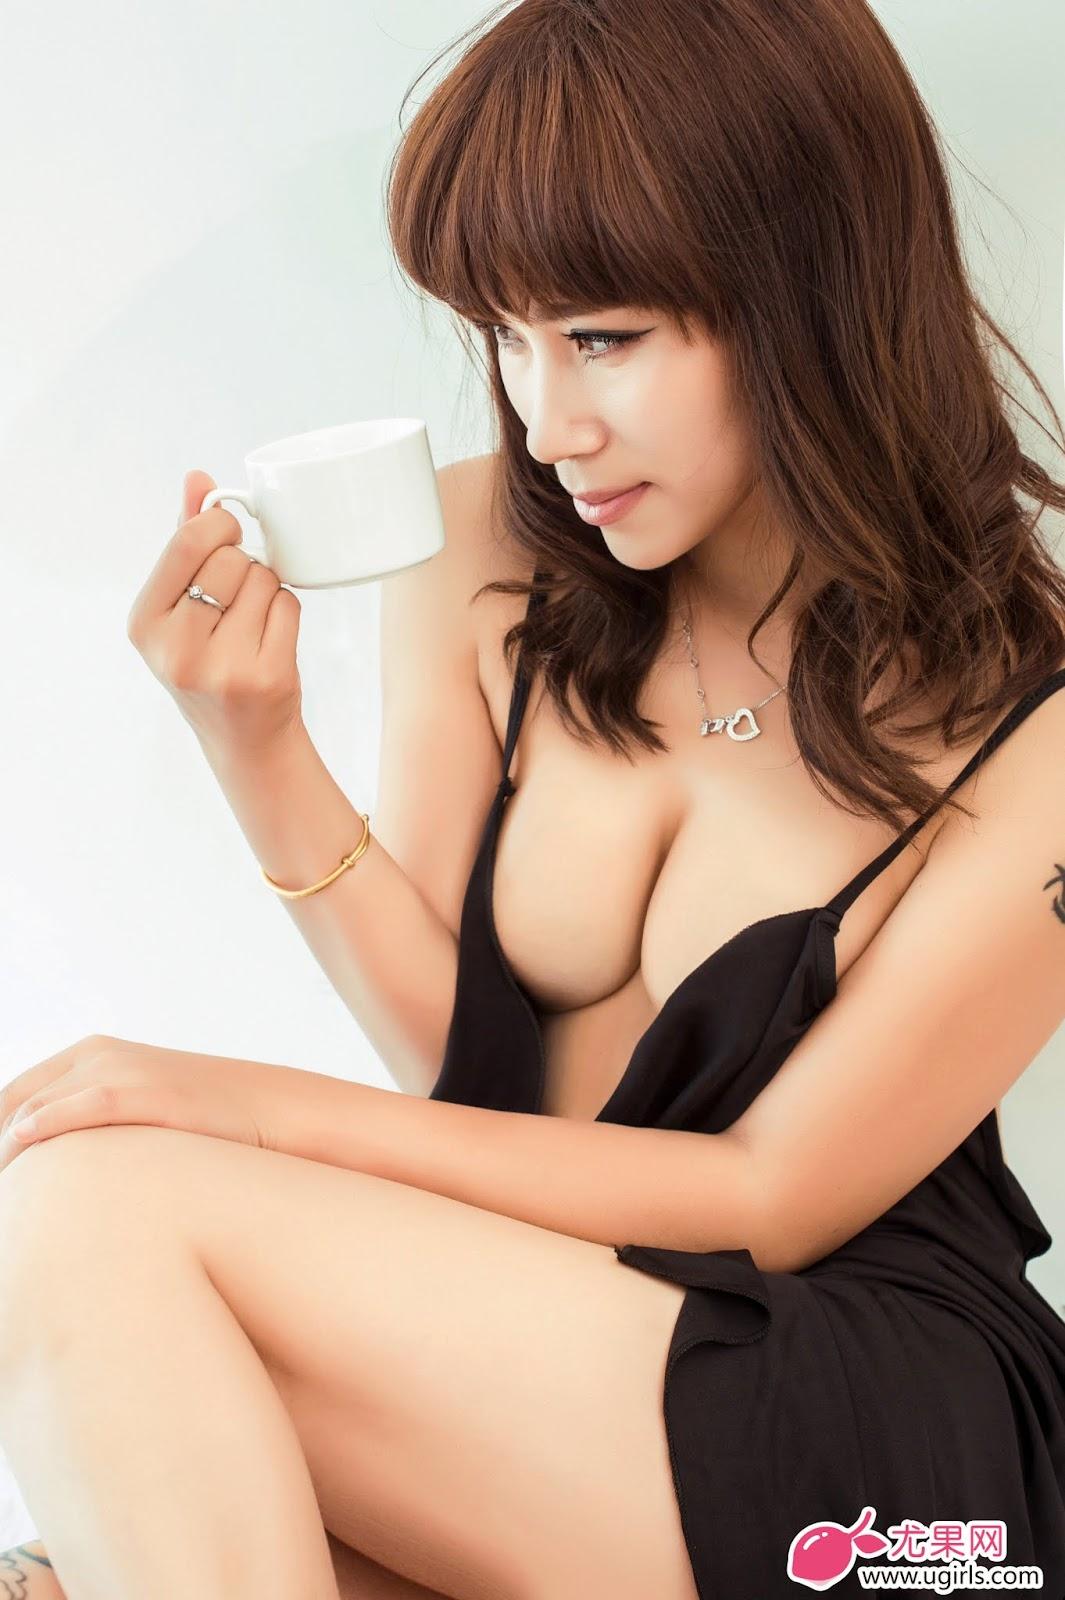 DLS 0166 - Hot Girl Ugirls No.021 Model: 田依依